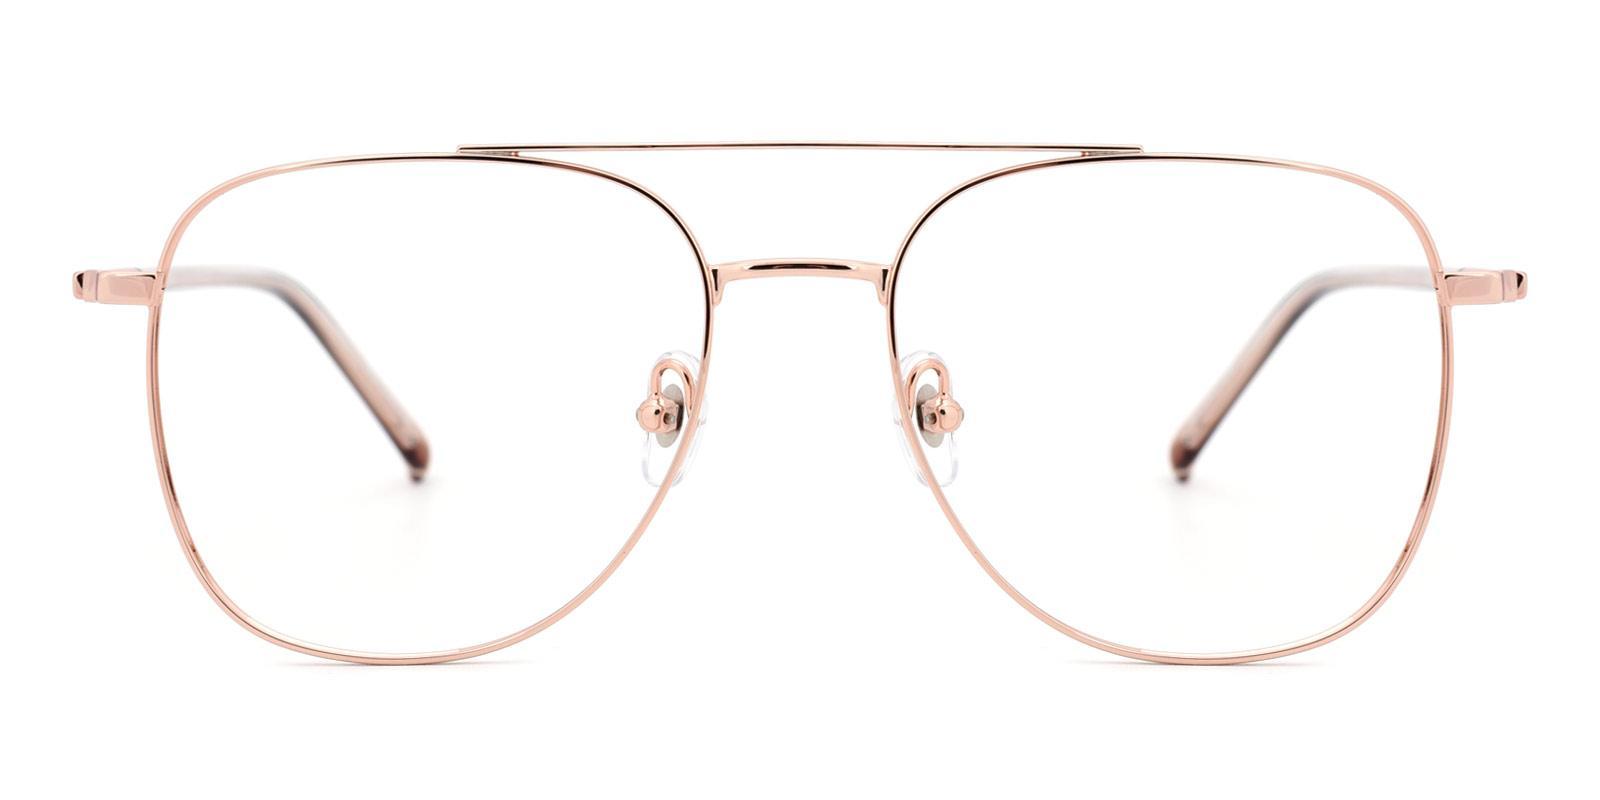 Defender-Gold-Aviator-Metal-Eyeglasses-detail